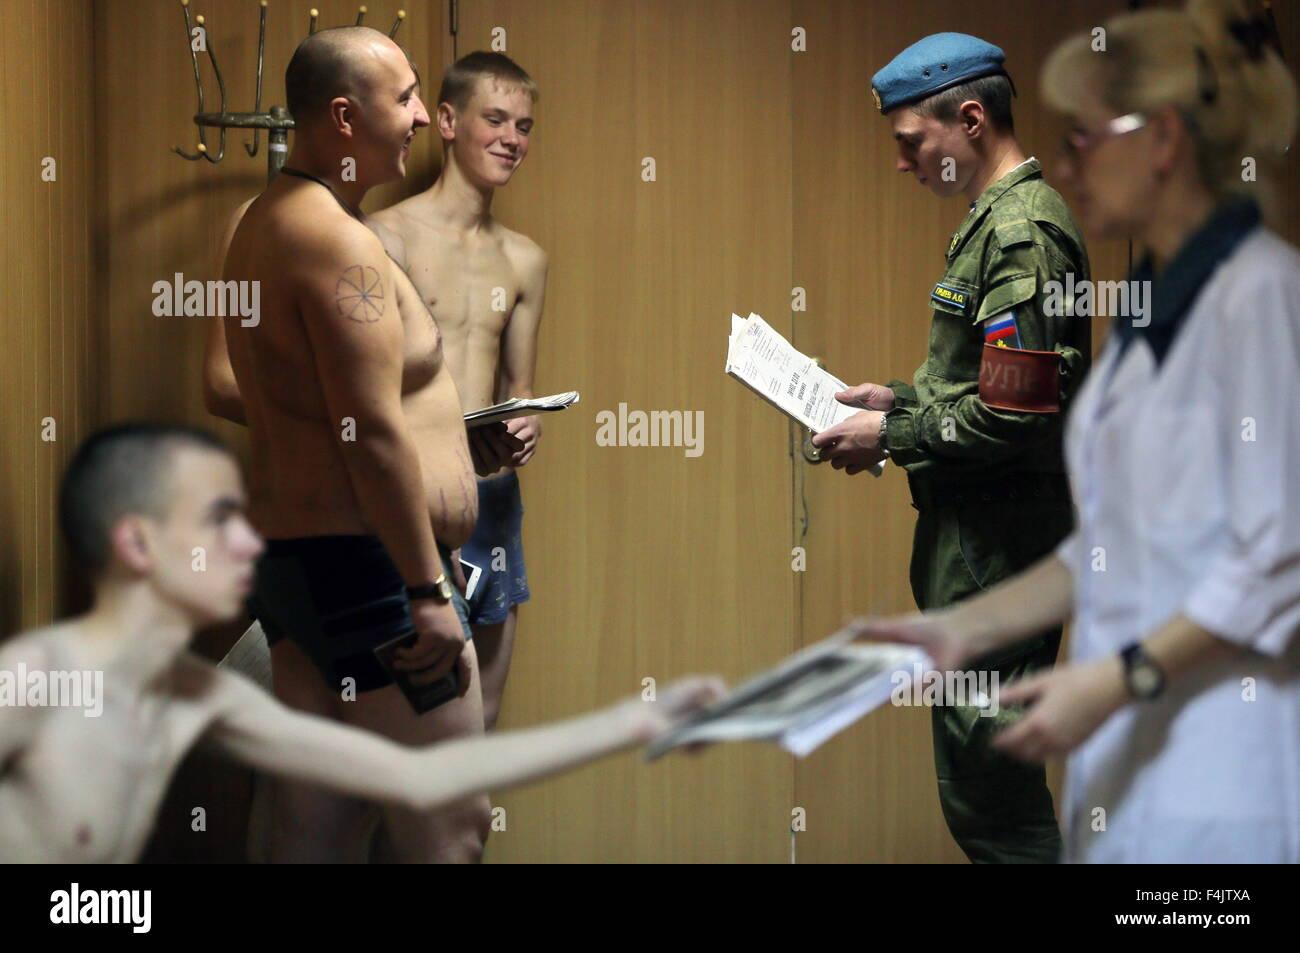 Military examinations medical gay fight club 9